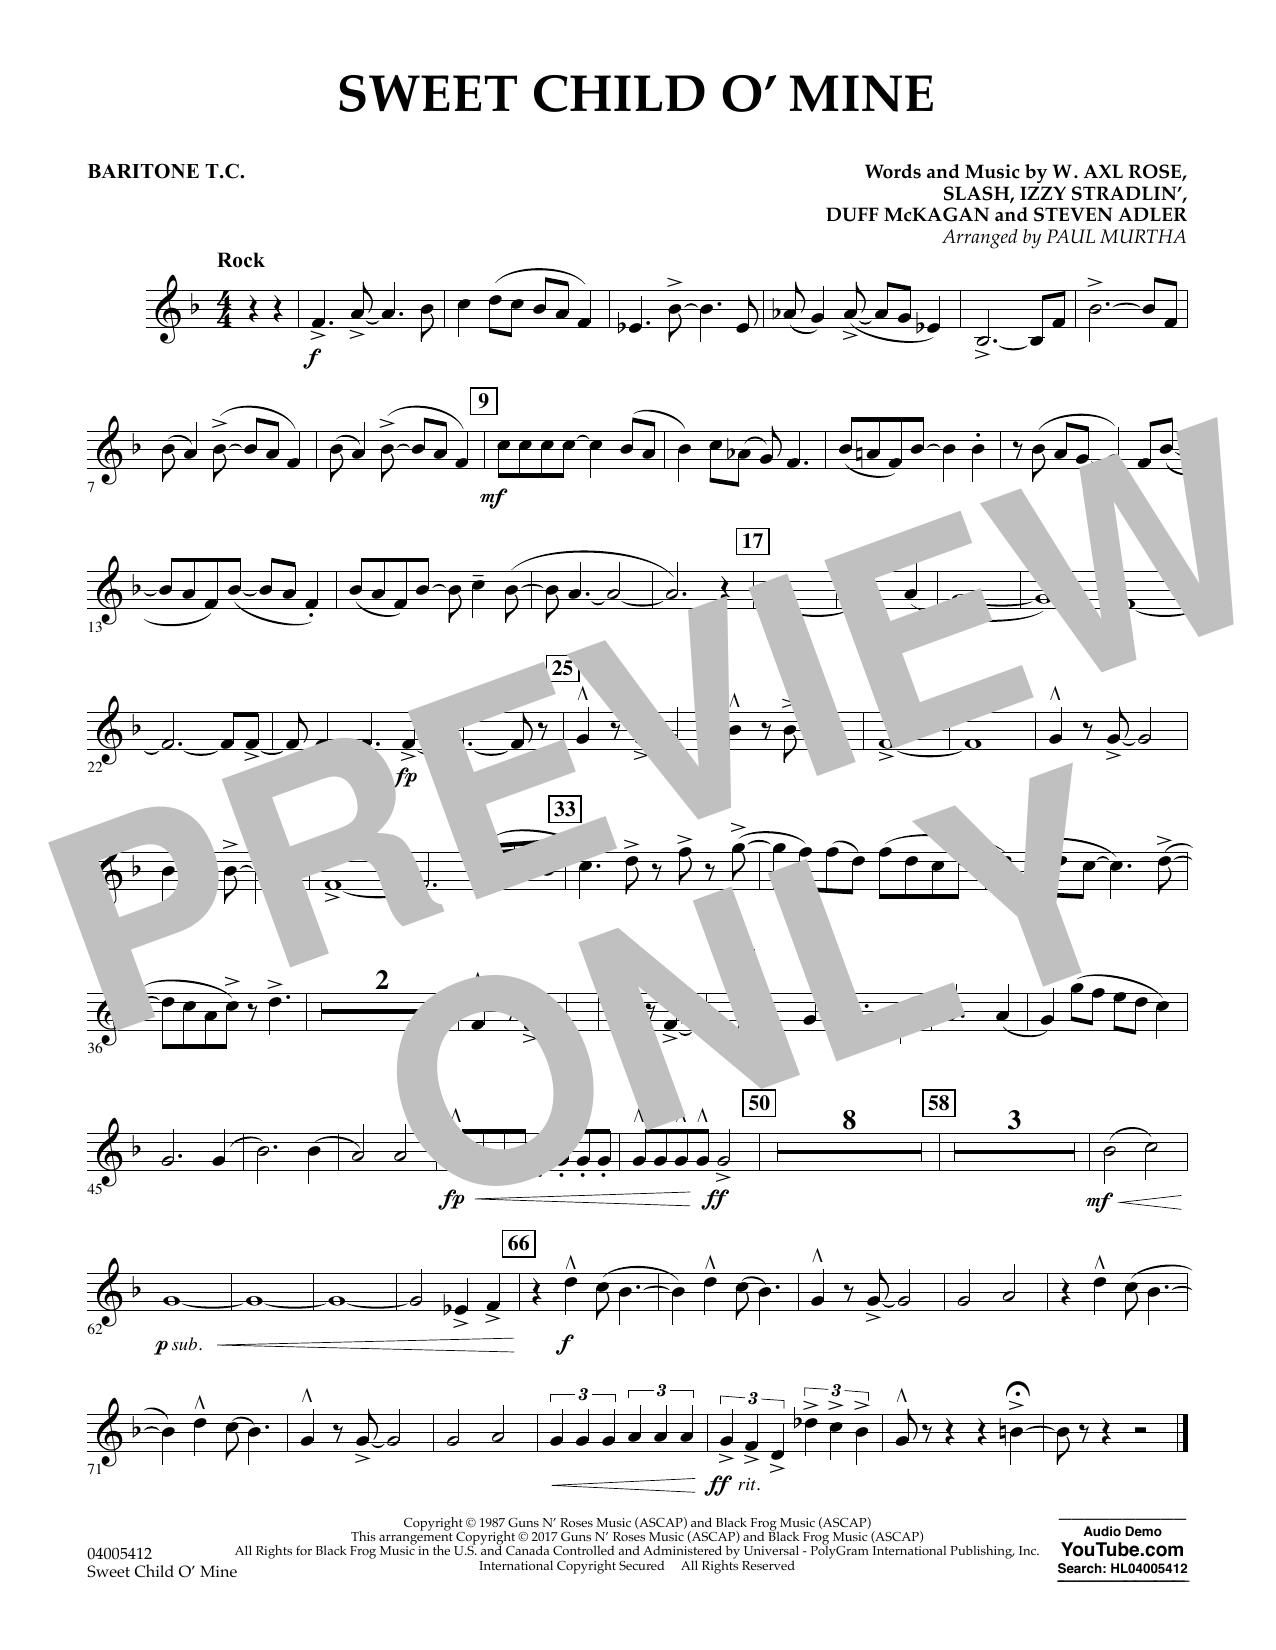 Sweet Child o' Mine - Baritone T.C. (Concert Band)